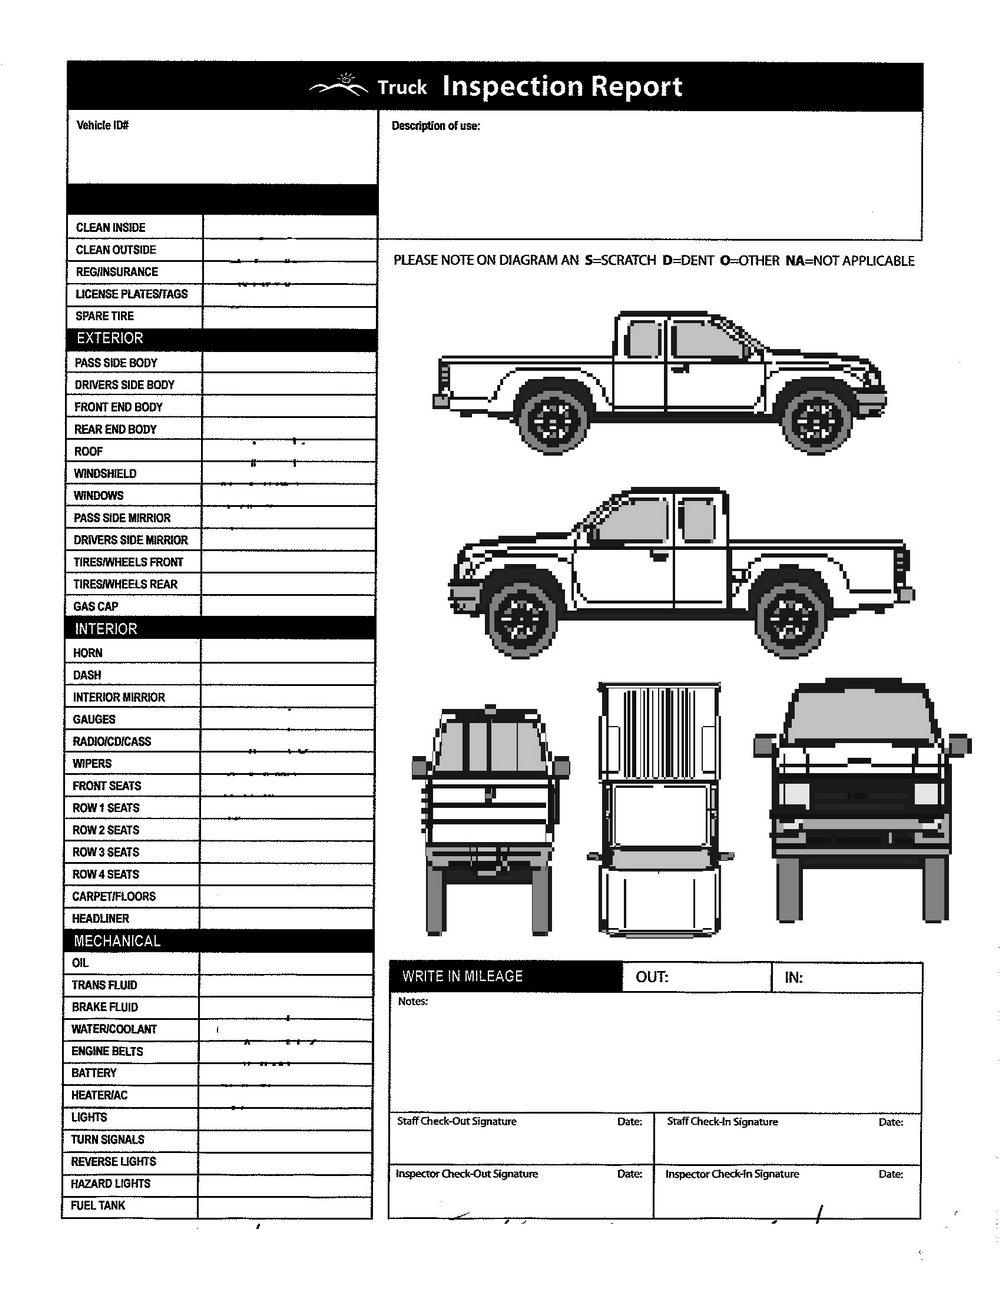 Truck Inspection Checklist Template